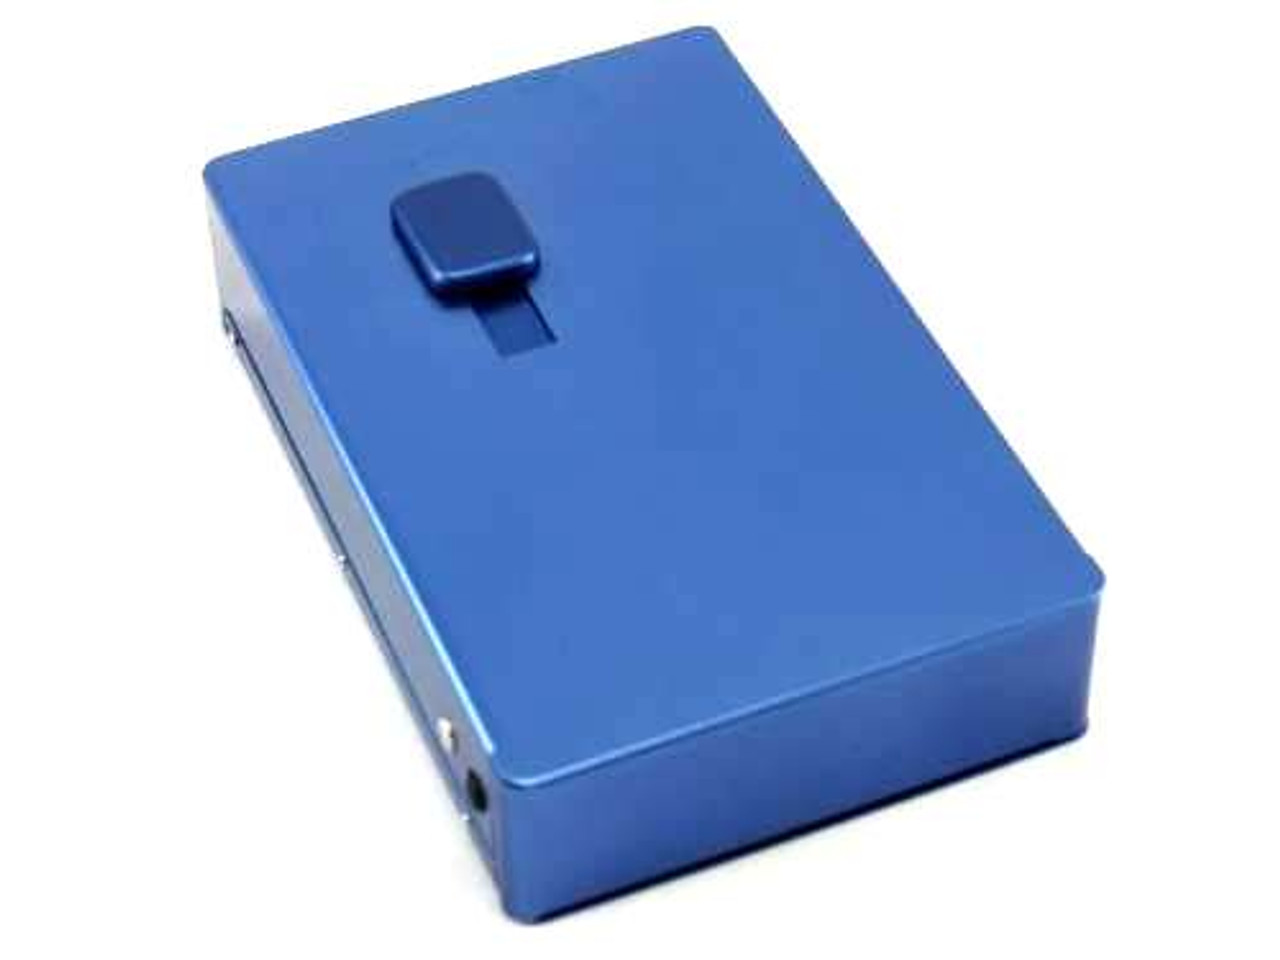 Blue Picture Frame Auto Dispensing Cigarette Case